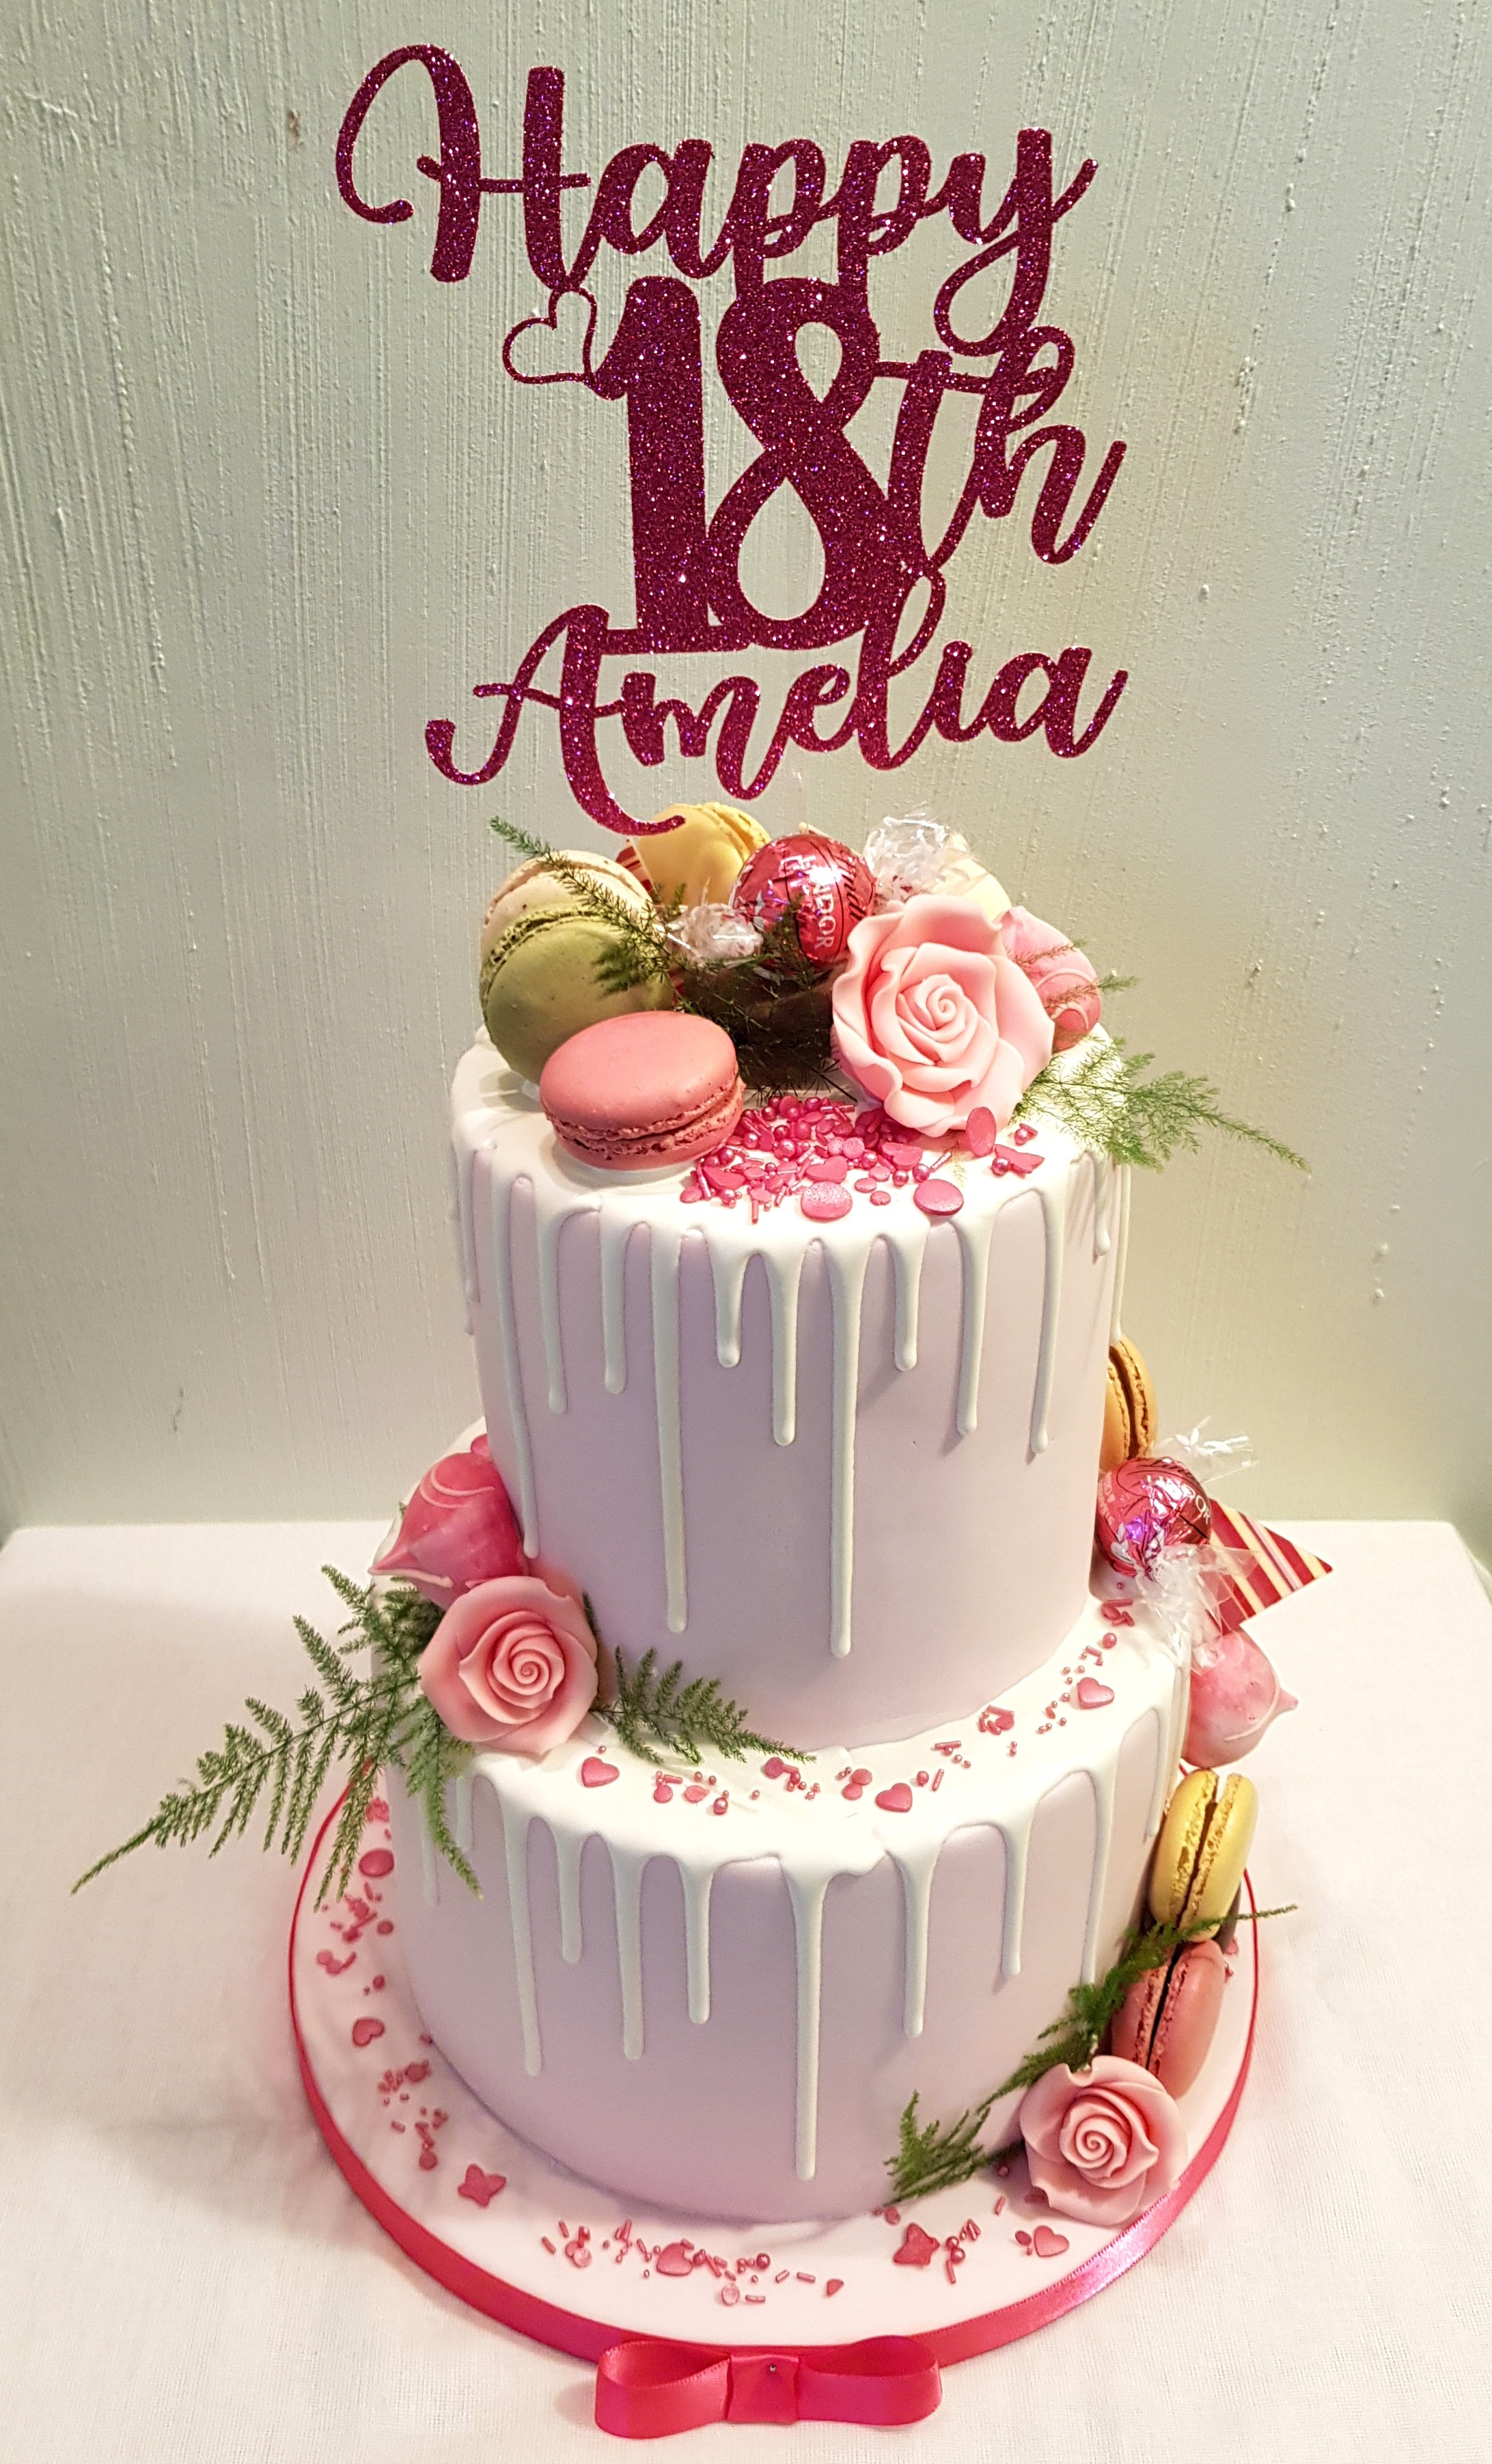 2 Tier Drip Celebration Cake